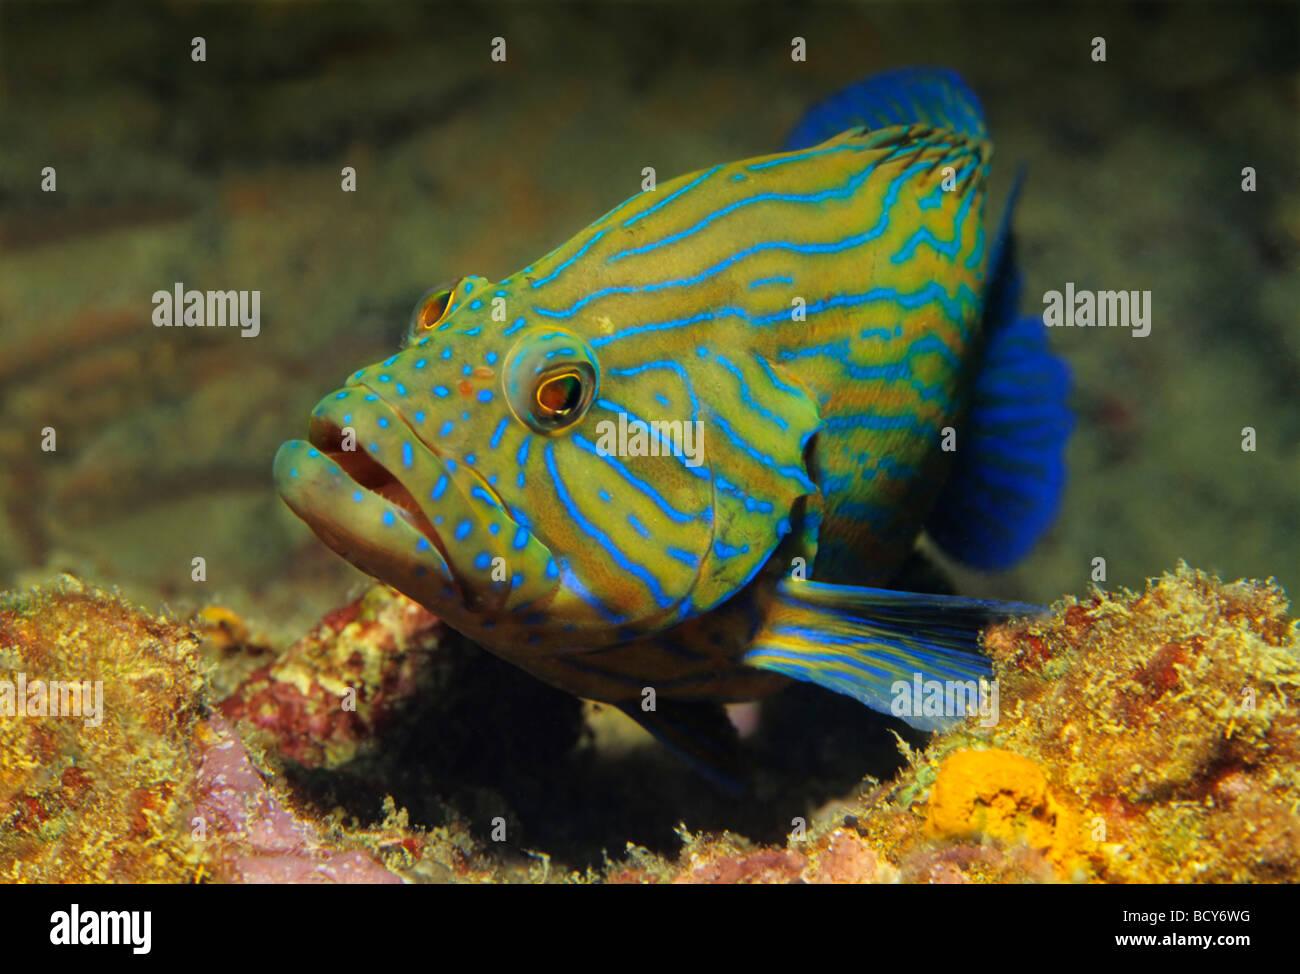 Blue stripe grouper (Cephalopholis formosa) in coral reef, Similan Islands, Andaman Sea, Thailand, Asia, Indian - Stock Image